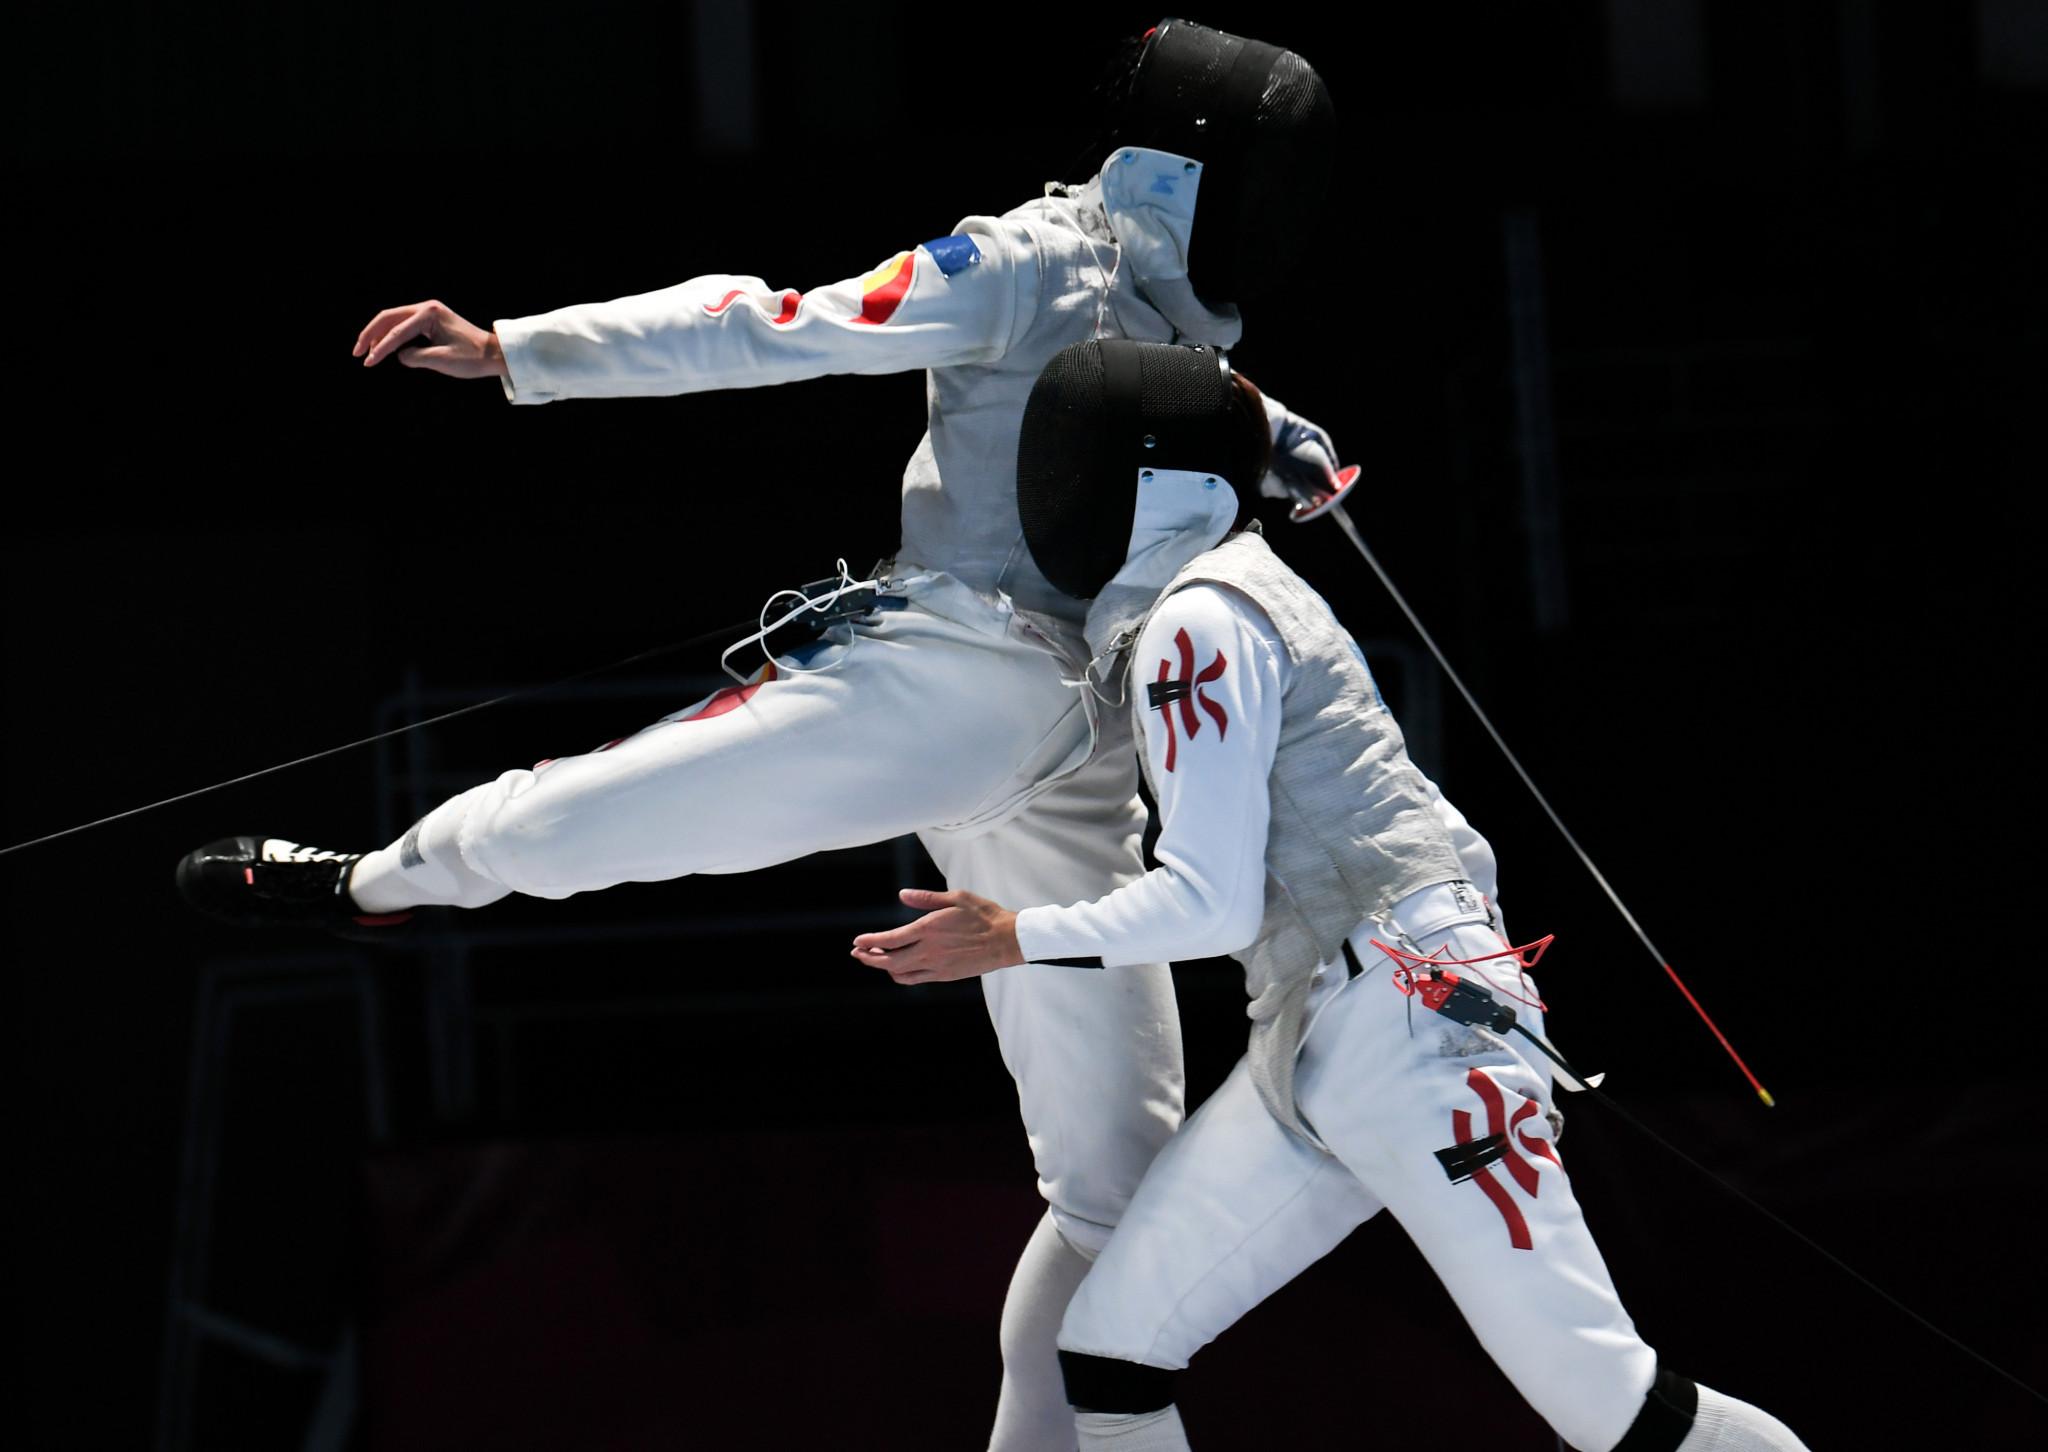 China's Huang Mengkai beat Hong Kong's Nicholas Edward Choi in the men's foil individual gold medal bout ©Getty Images